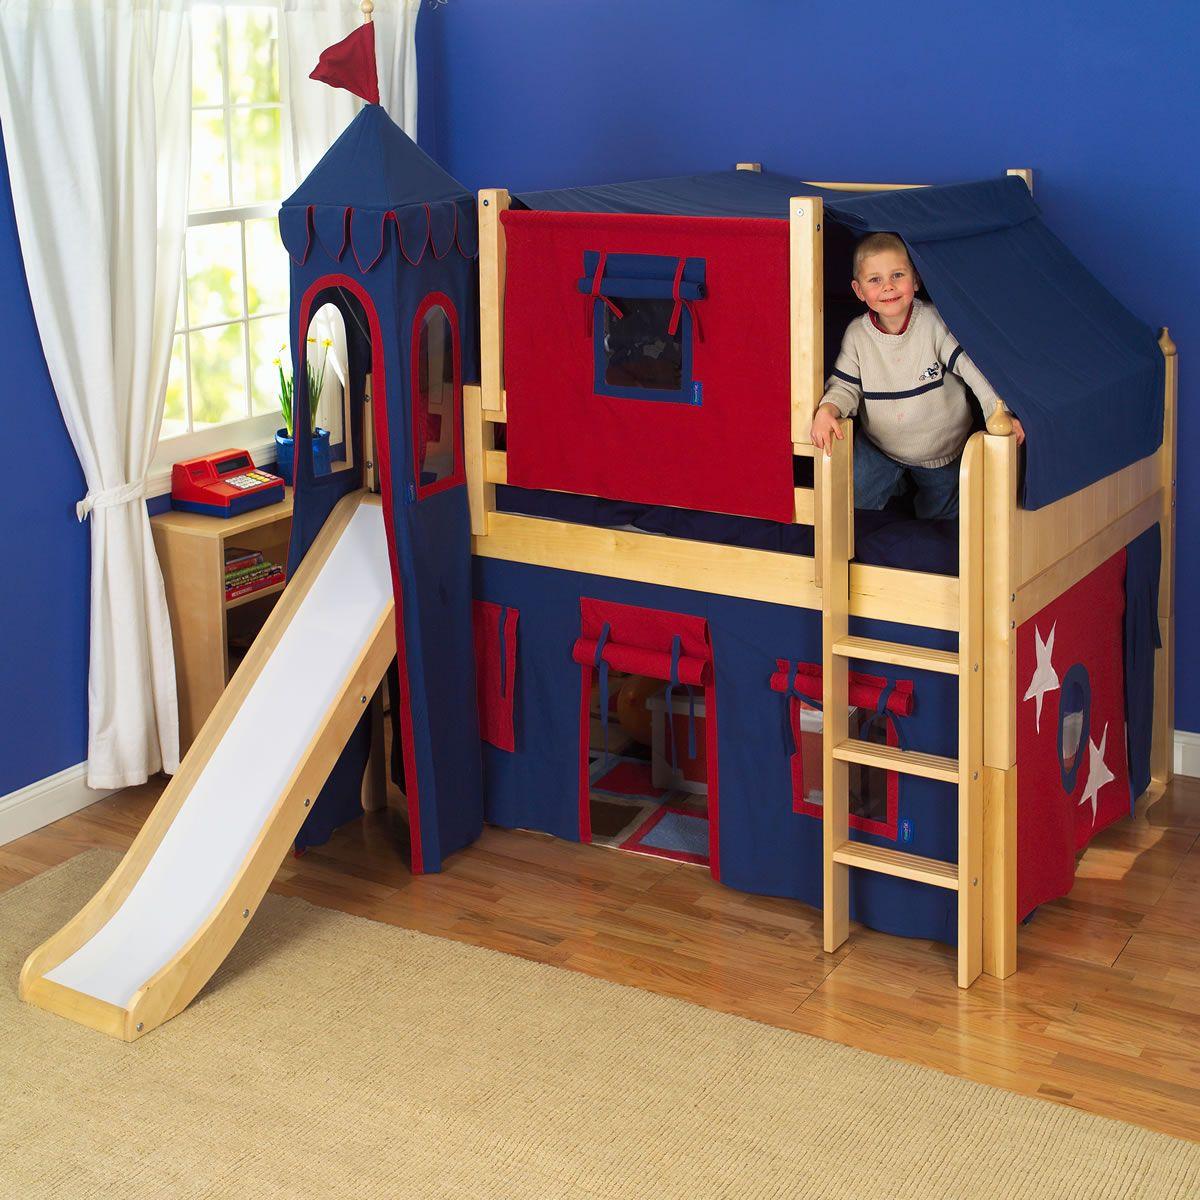 Lovely Boy toddler Bed with Slide